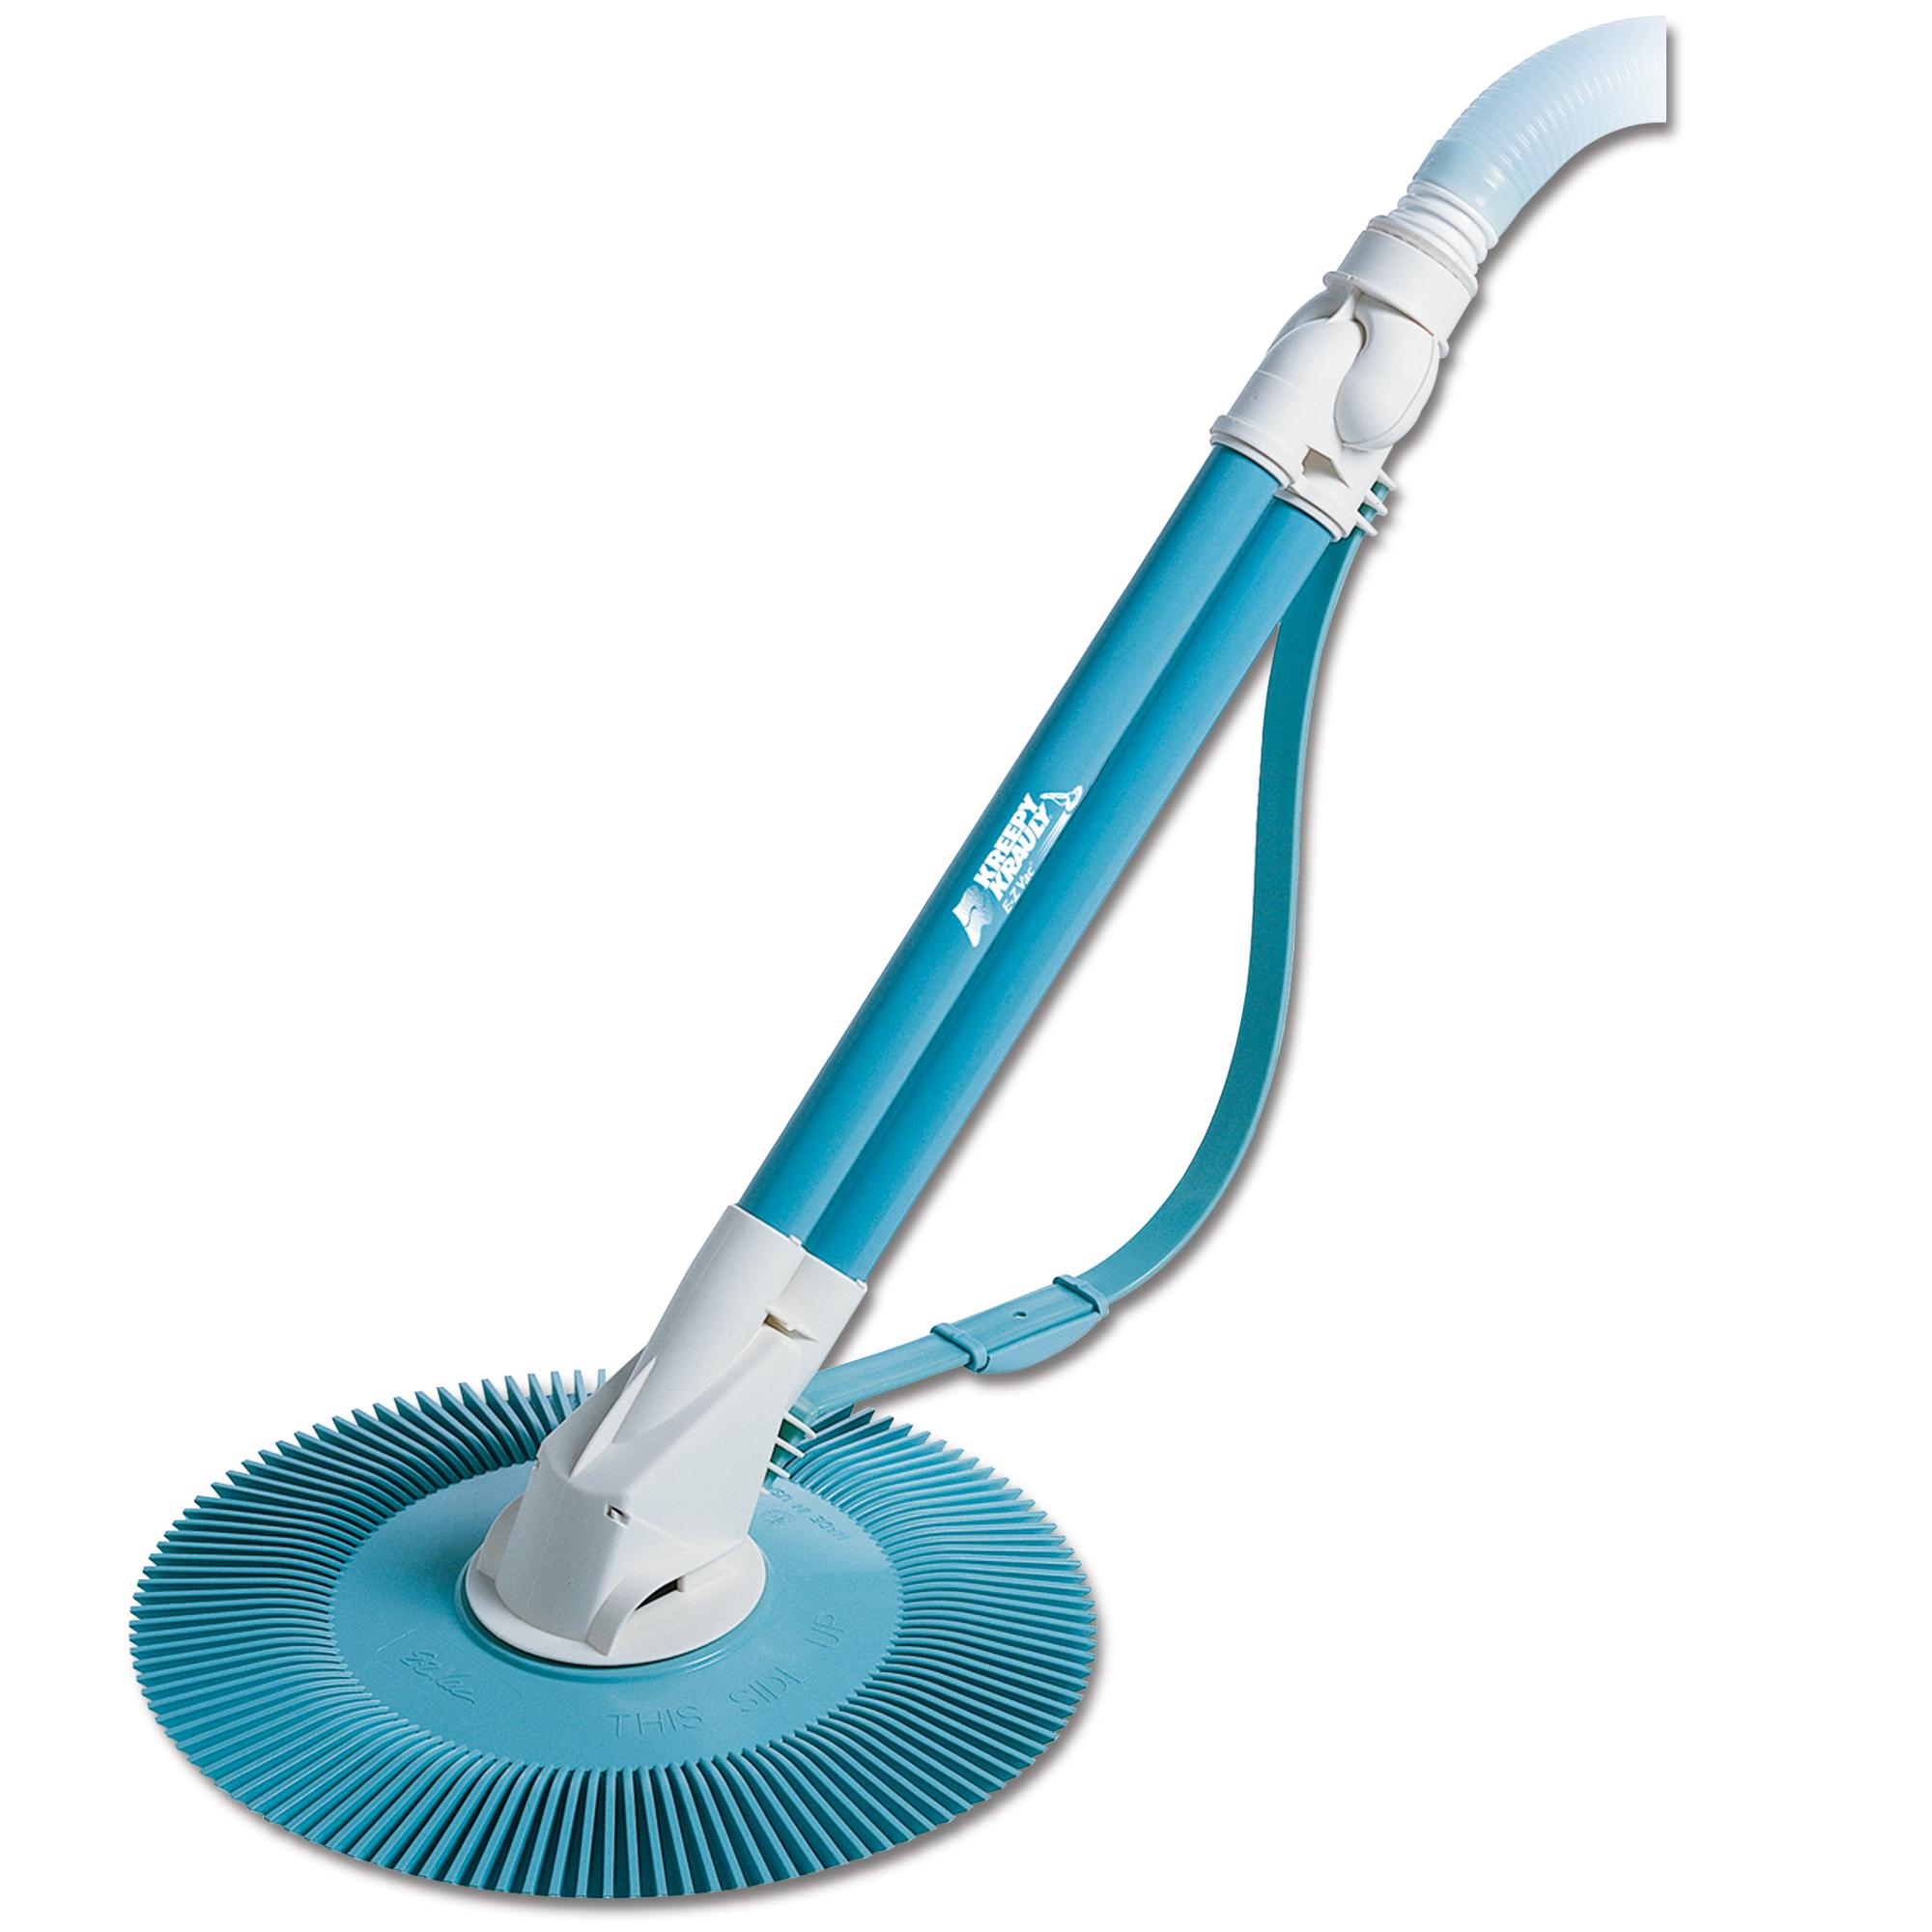 Kreepy Krauly E-Z Vac Automatic Above Ground Pool Cleaner